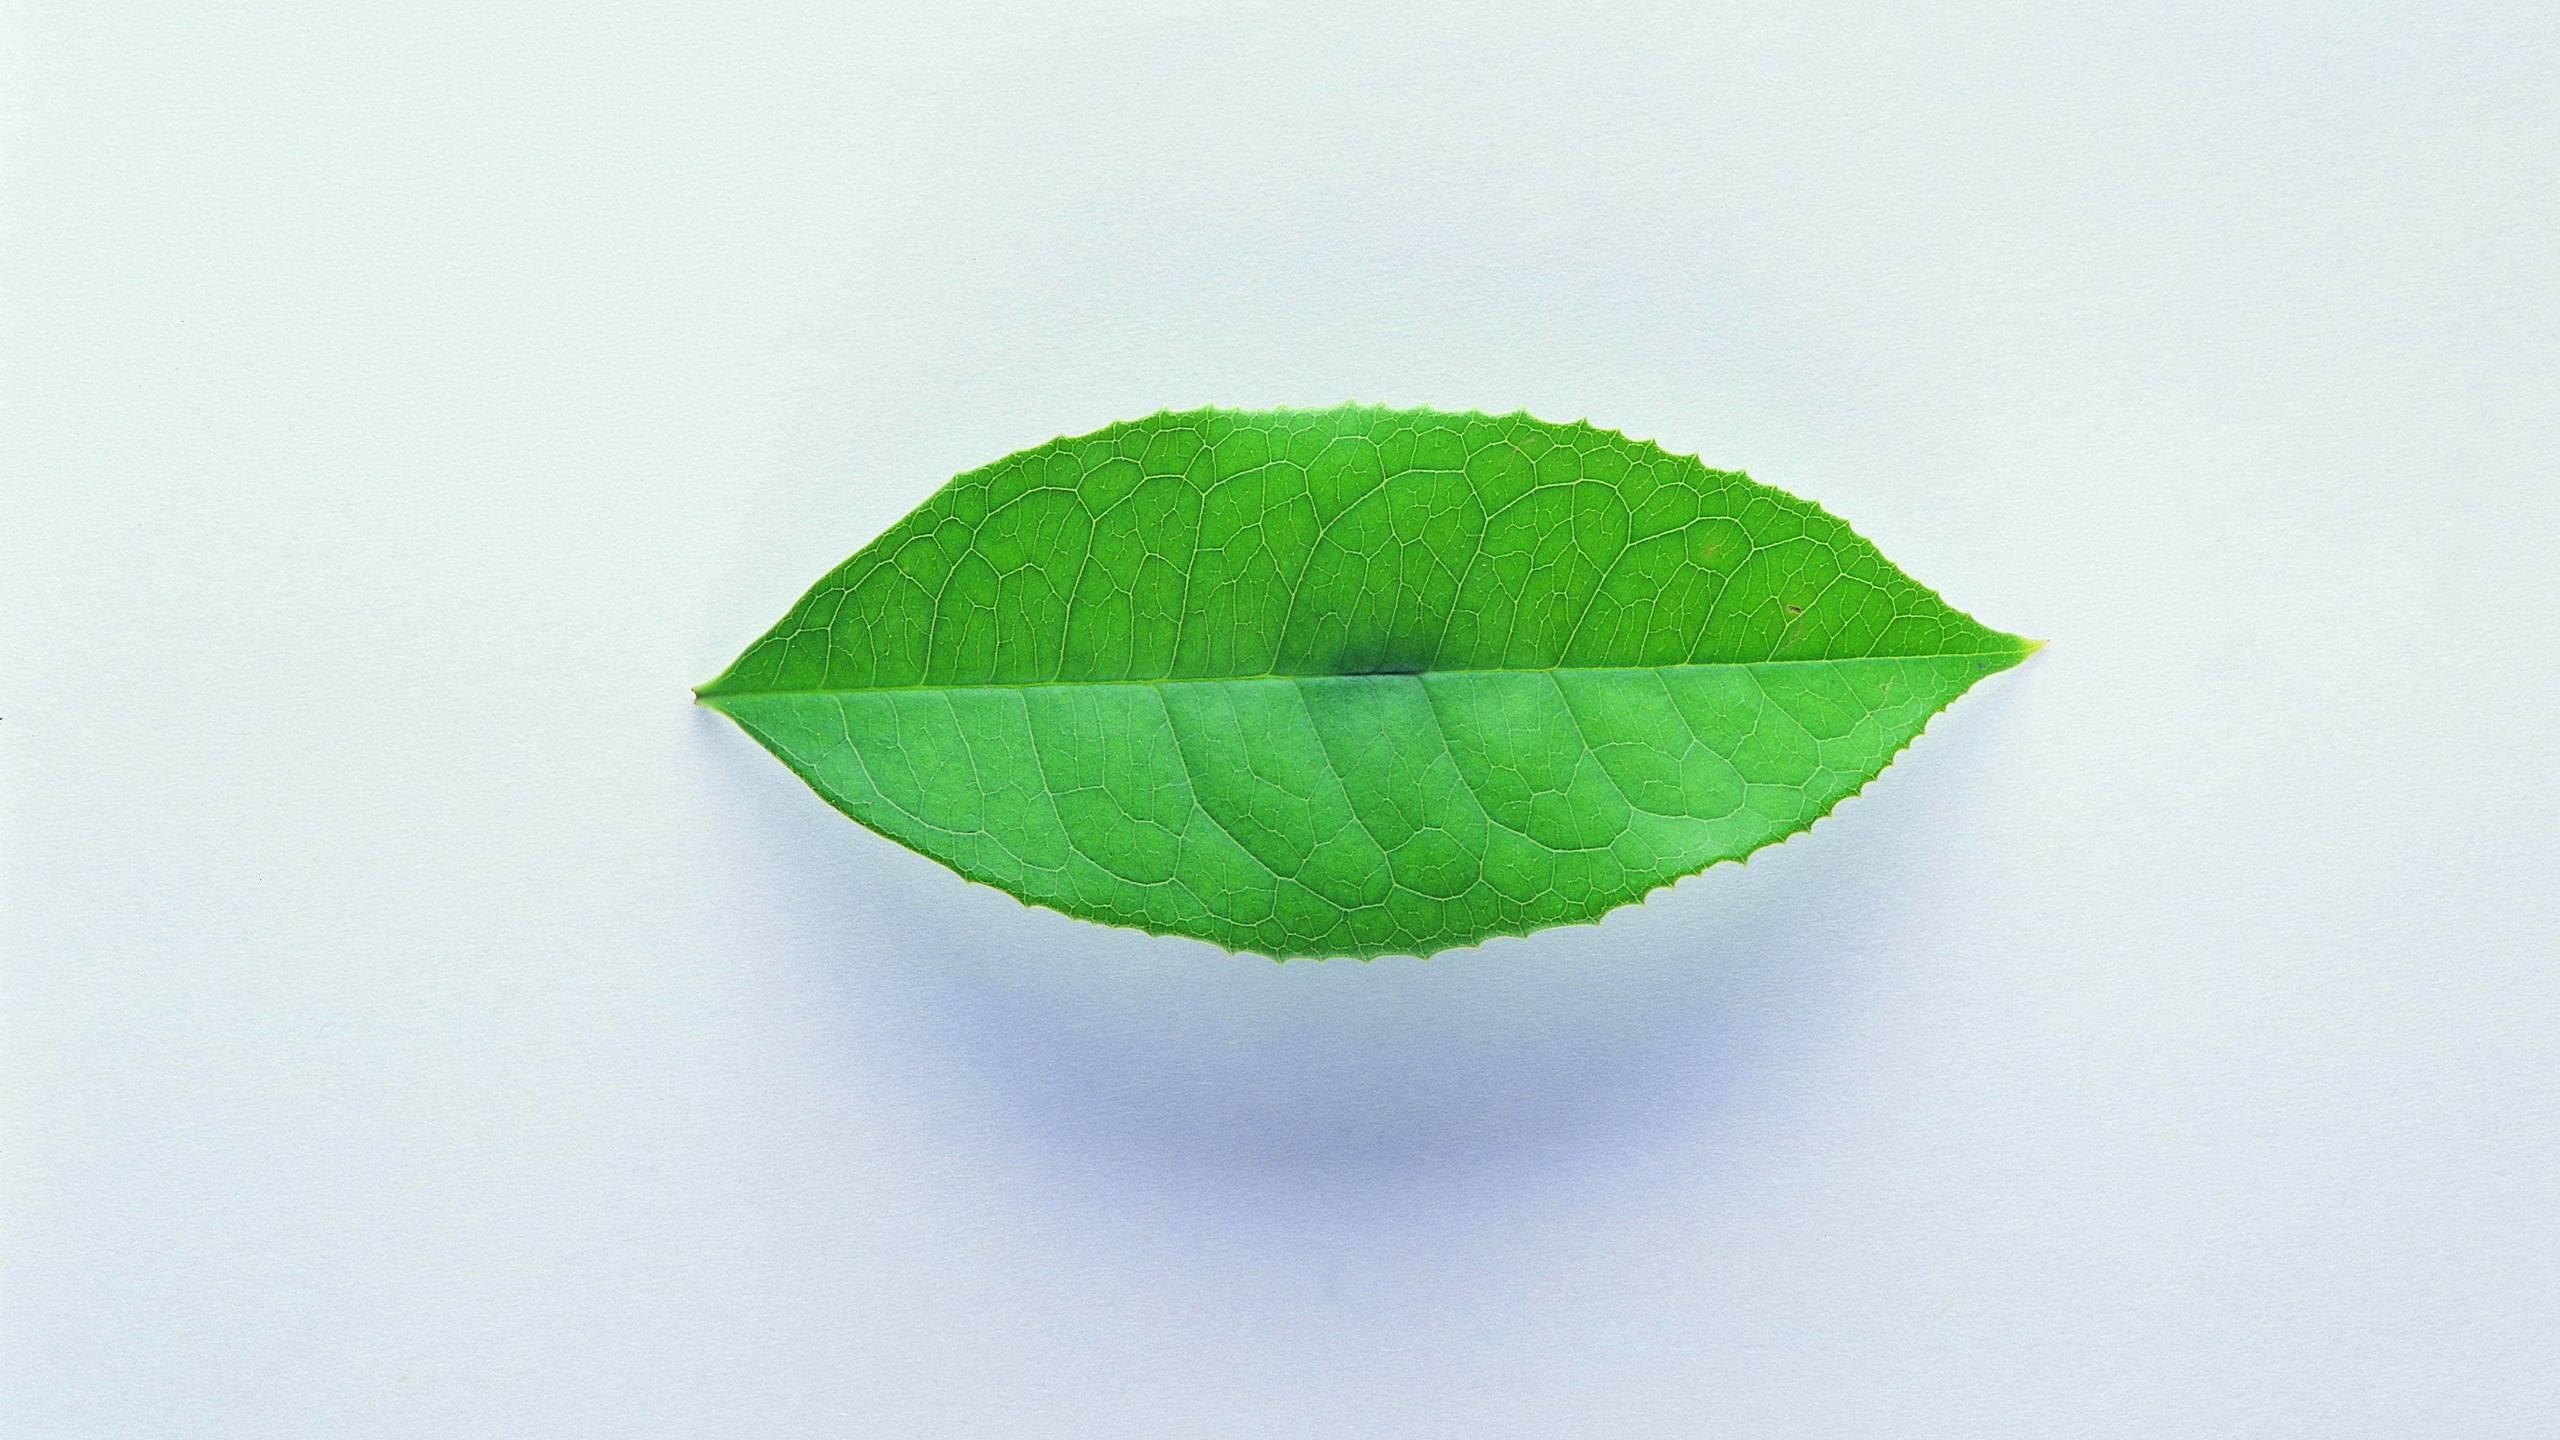 обои лист, зеленый, прожилки, фон белый картинки фото